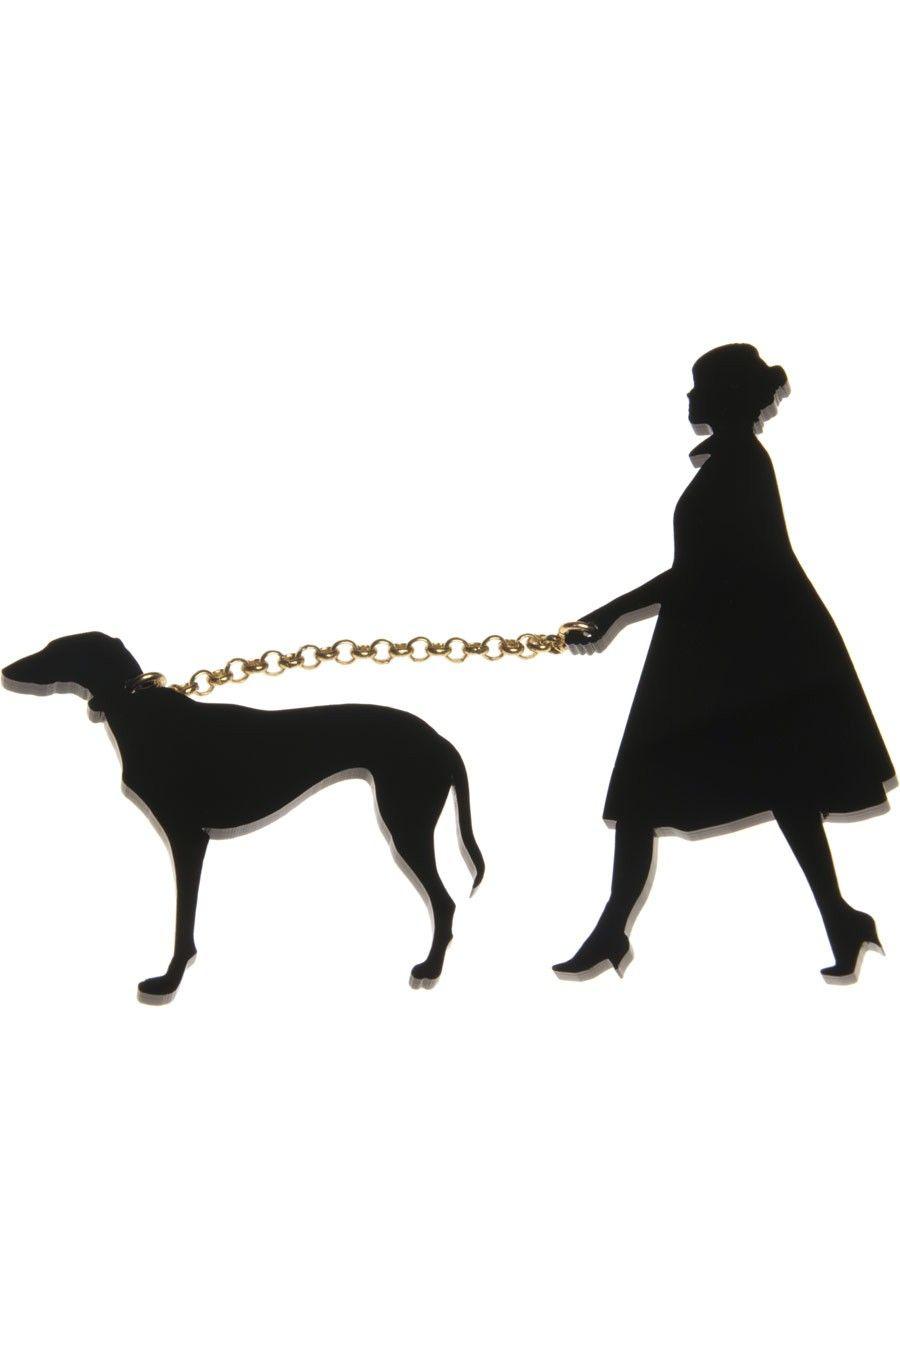 Lady  Dog Brooch. From Tatty Devine